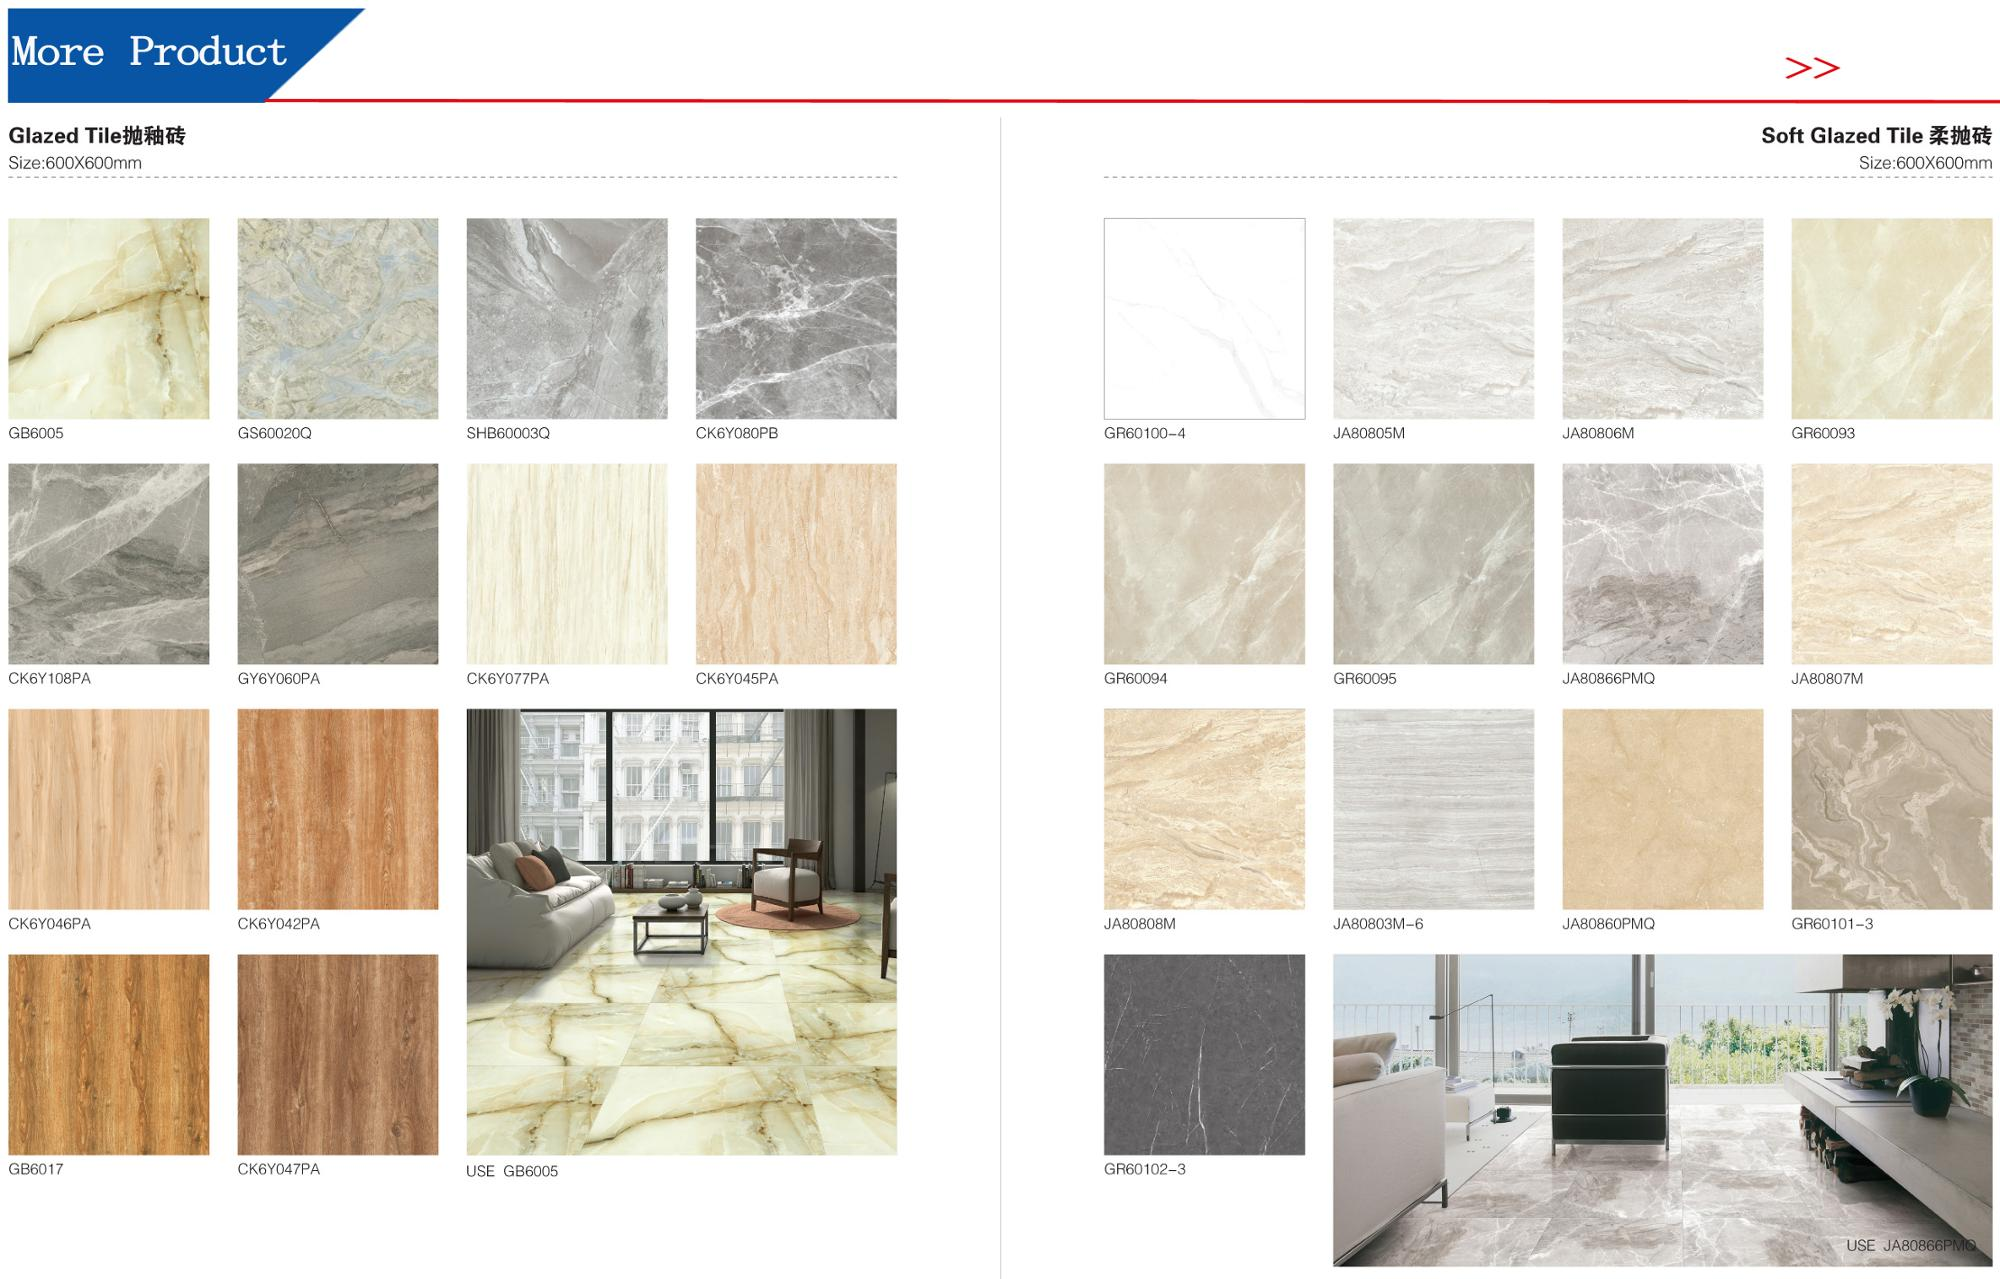 Foshan New House Pink Ceramic Floor Tiles Design Porcelanato Floor 60x60